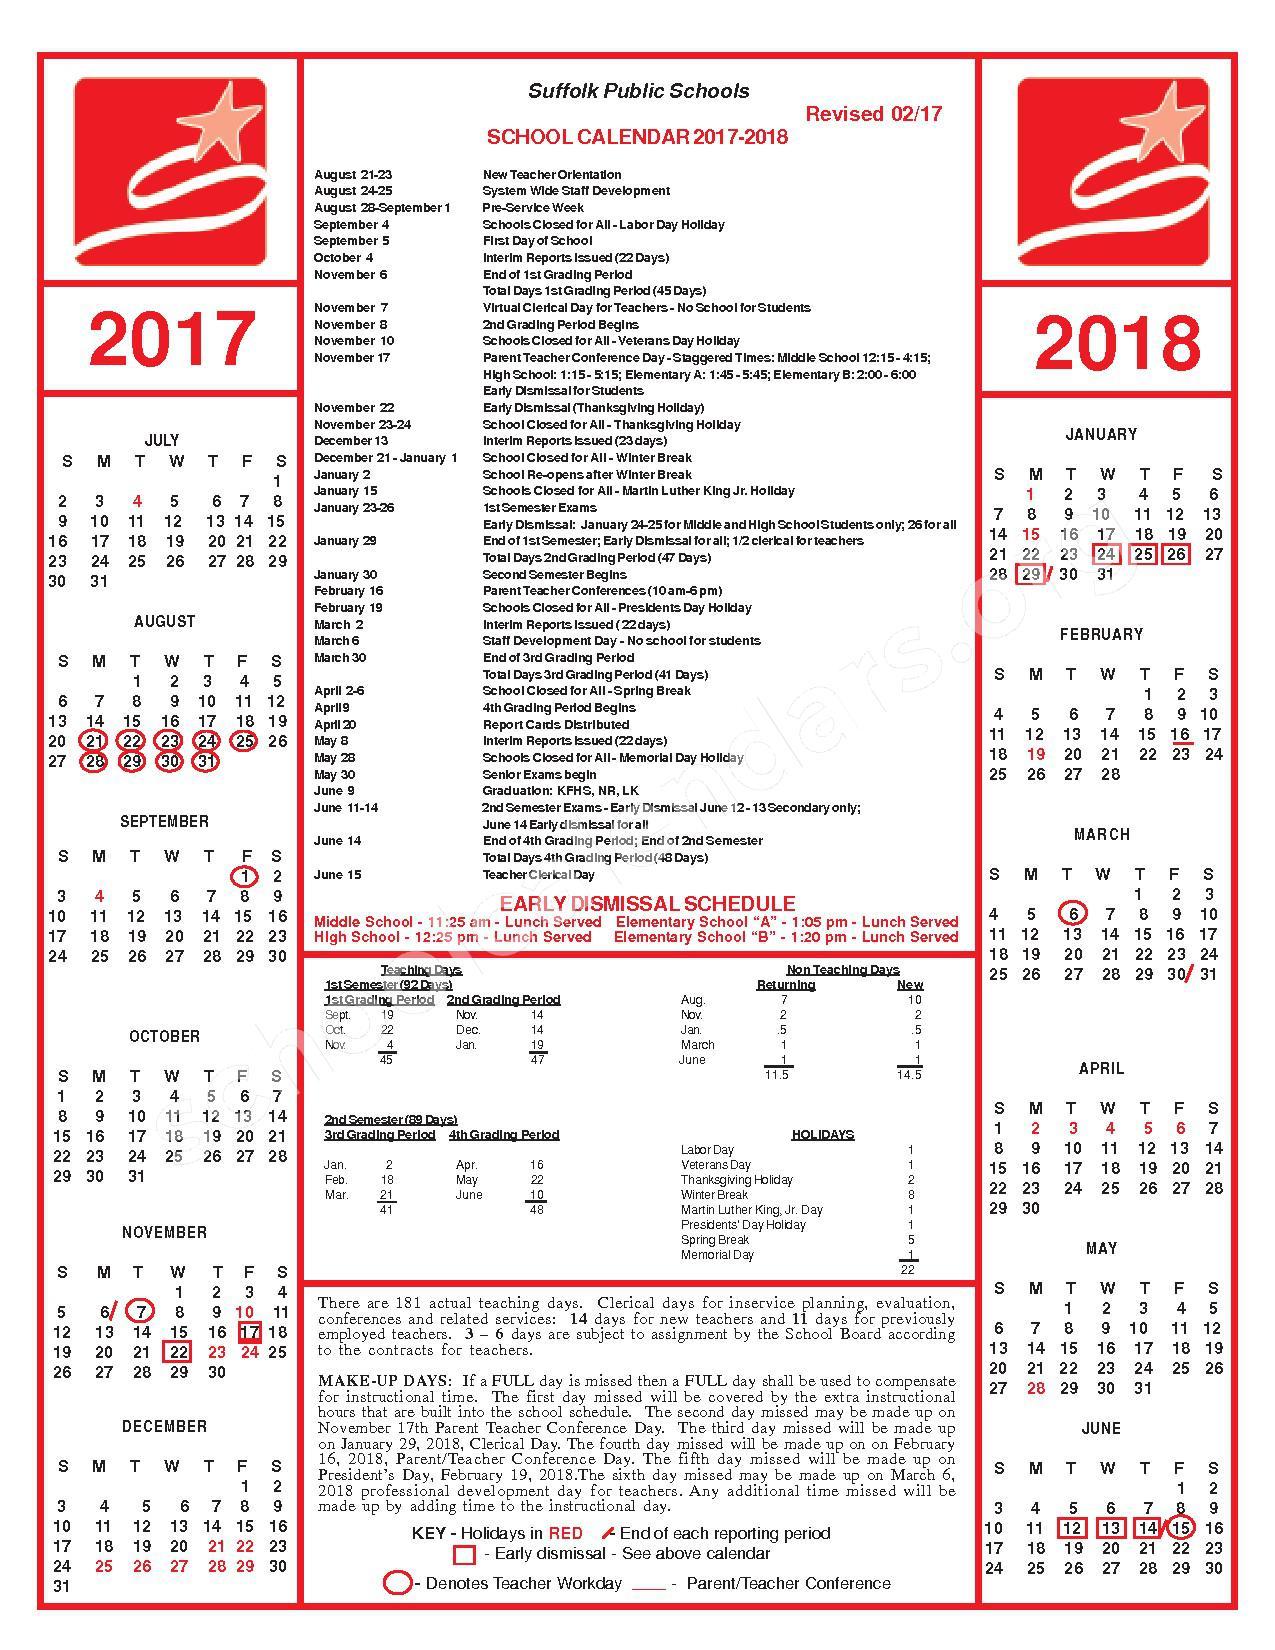 Suffolk Public Schools Calendars – Suffolk, VA